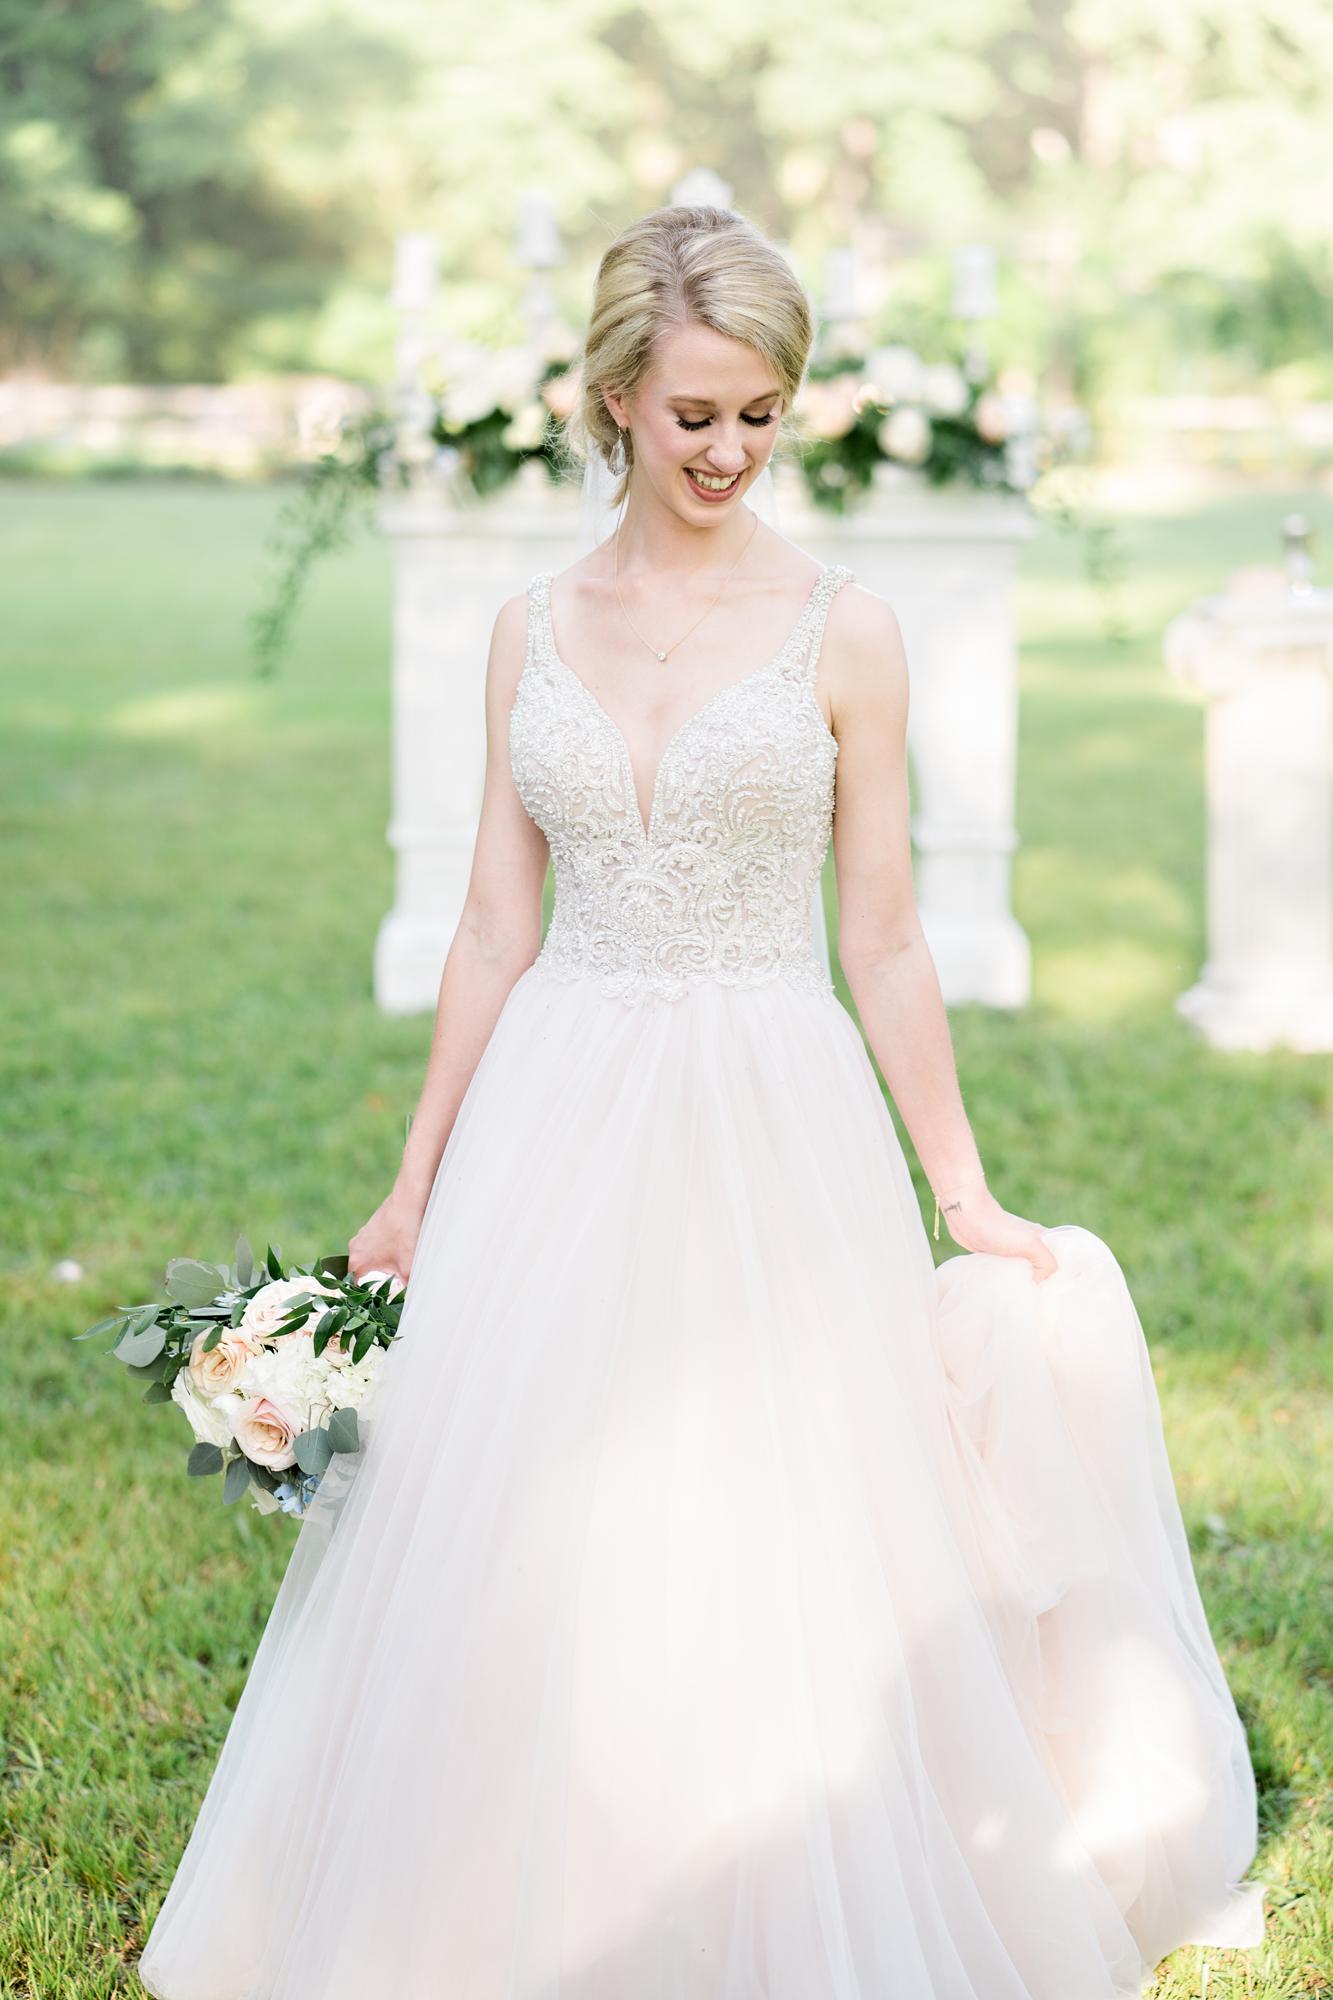 Alabama-Photographers-Nick-Drollette-Wedding-Photography-152.jpg